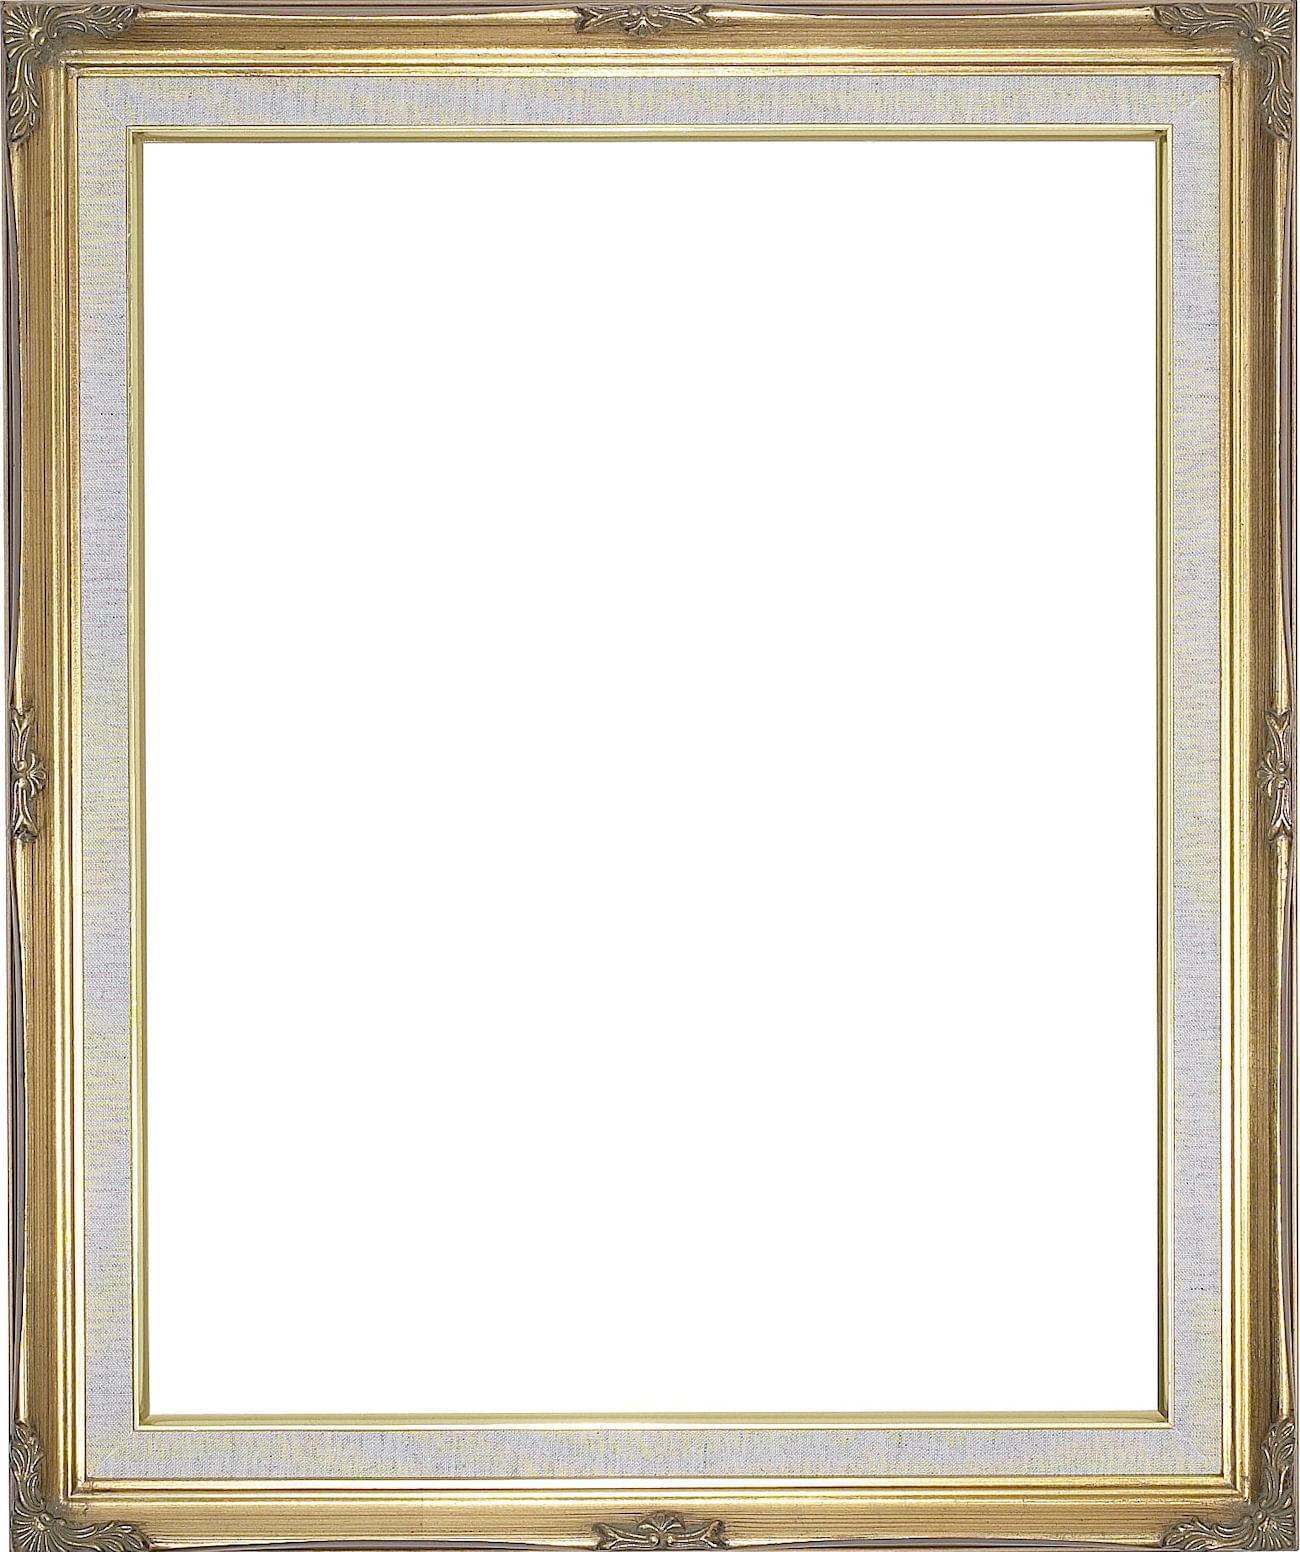 custom photo painting picture frames online frames express. Black Bedroom Furniture Sets. Home Design Ideas